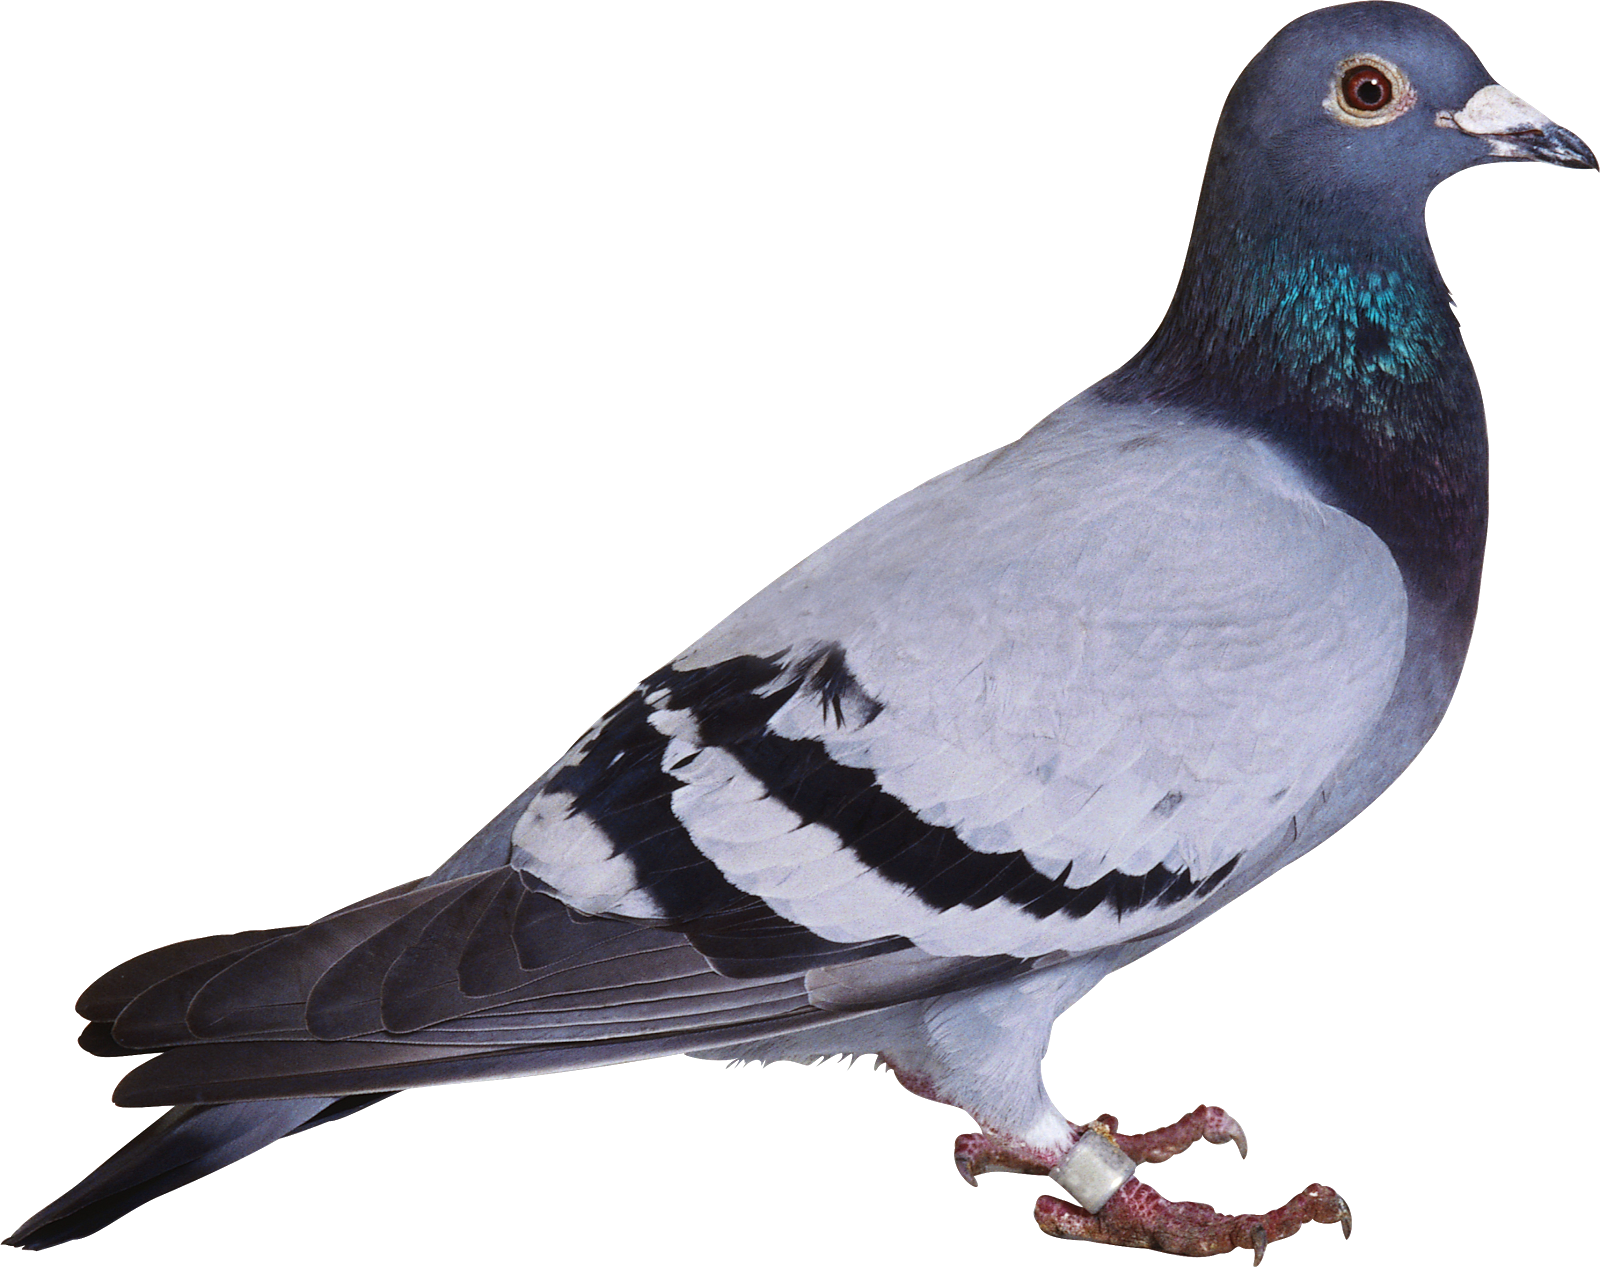 Pidgin, Not Pigeon...